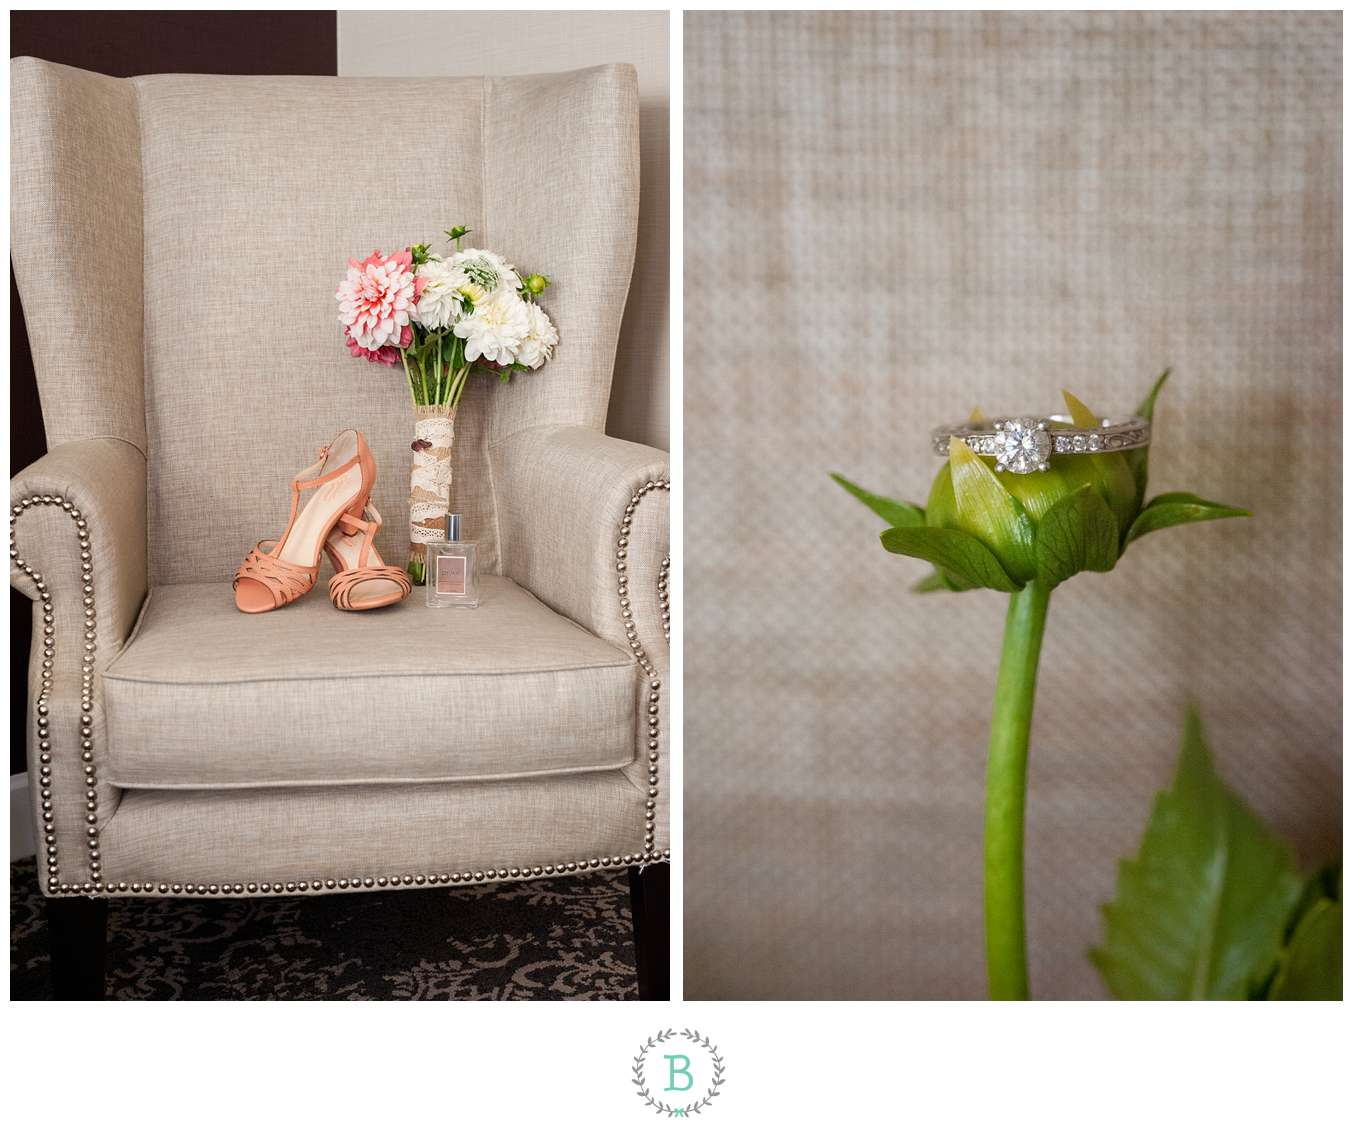 B-Jones-Photography-Seattle-Wedding-Photographer_0742.jpg